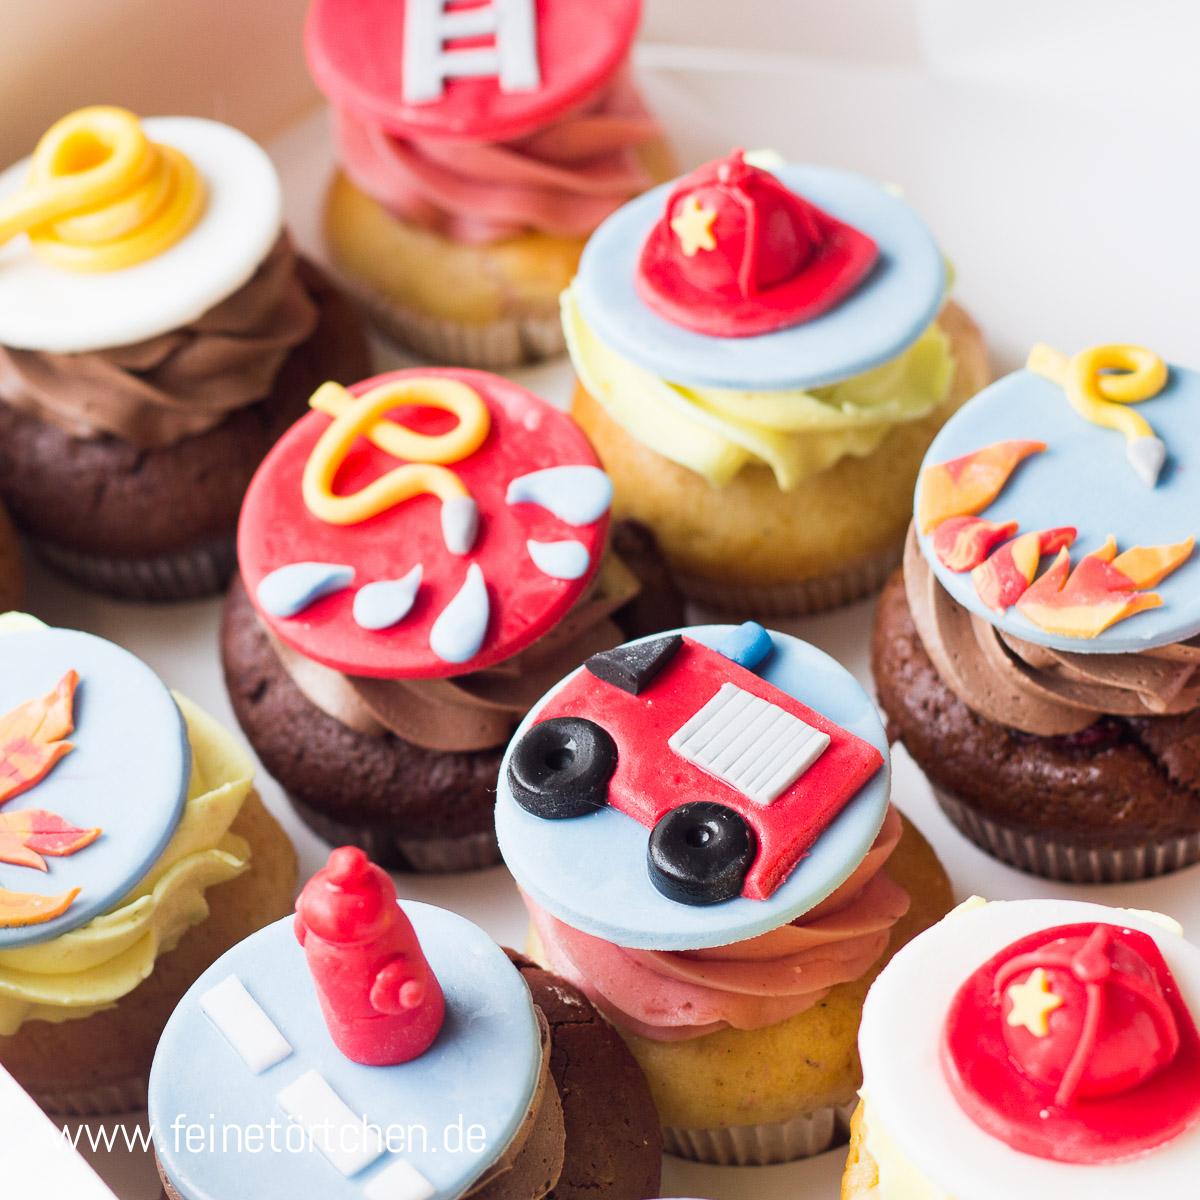 Cupcake Dekoration Feuerwehr Mademoiselle Cupcake Webshop